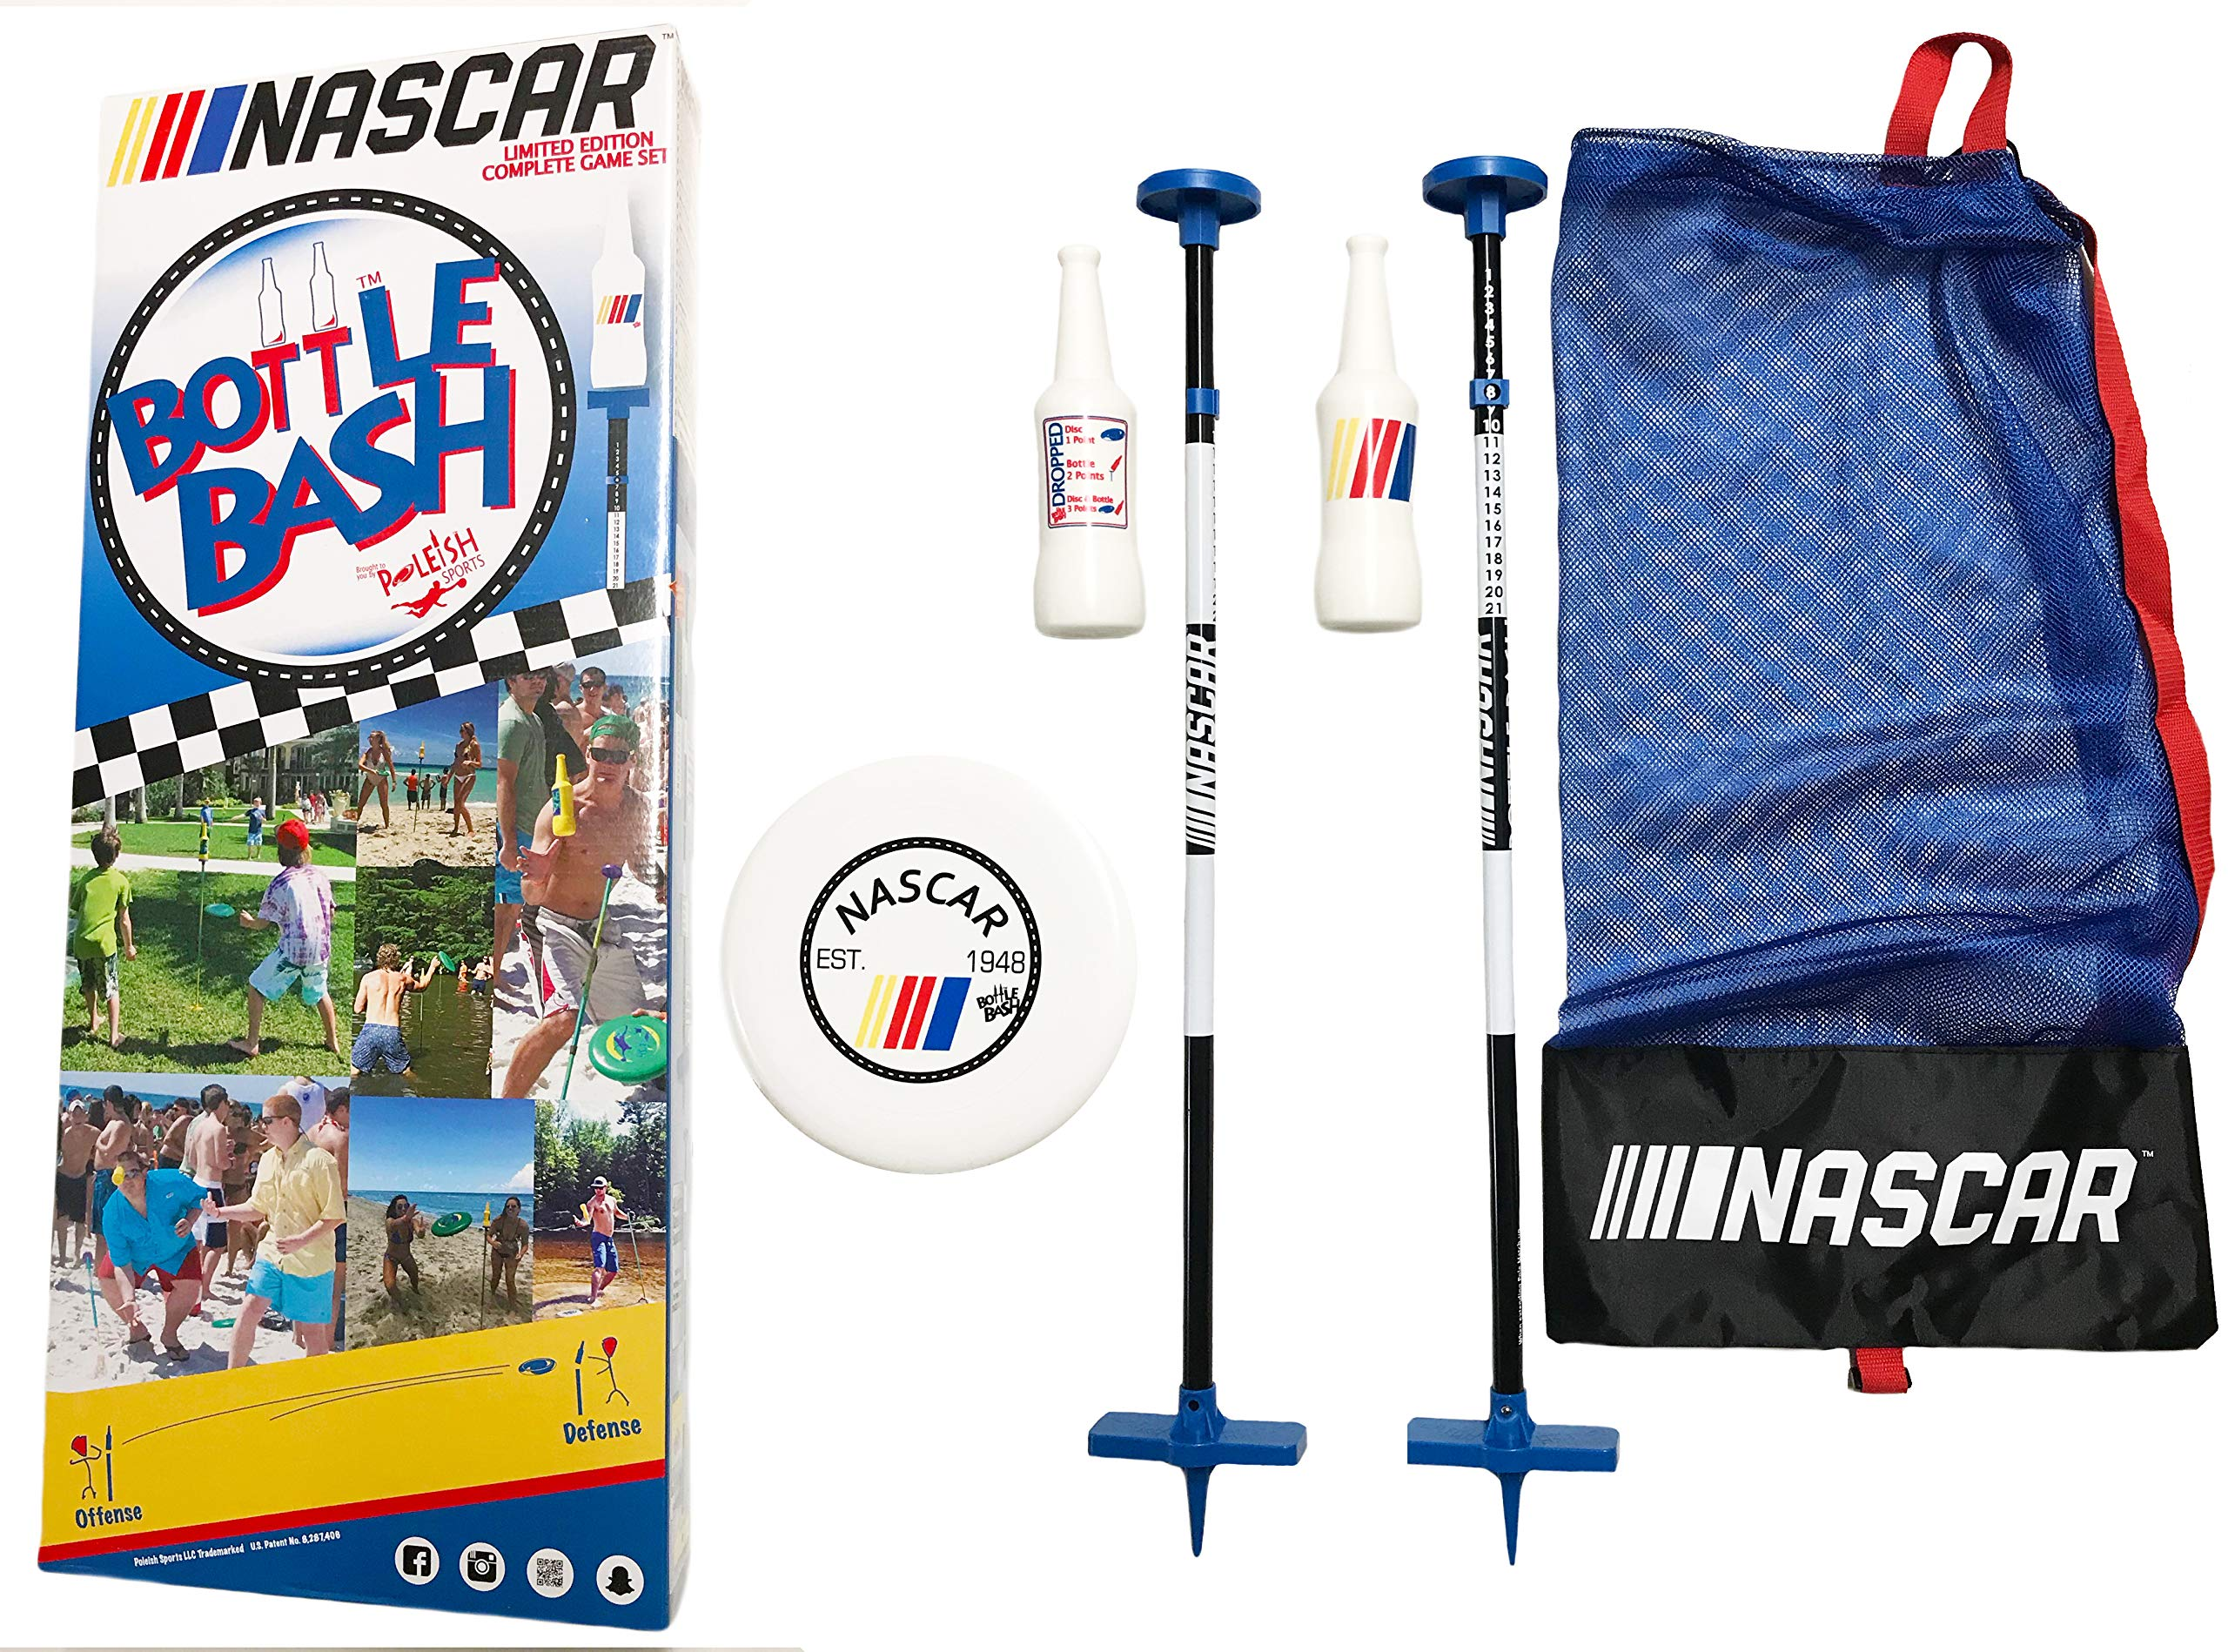 Bottle Bash NASCAR Game Set with Soft Surface Spike (Polish Horseshoes, Beersbee)